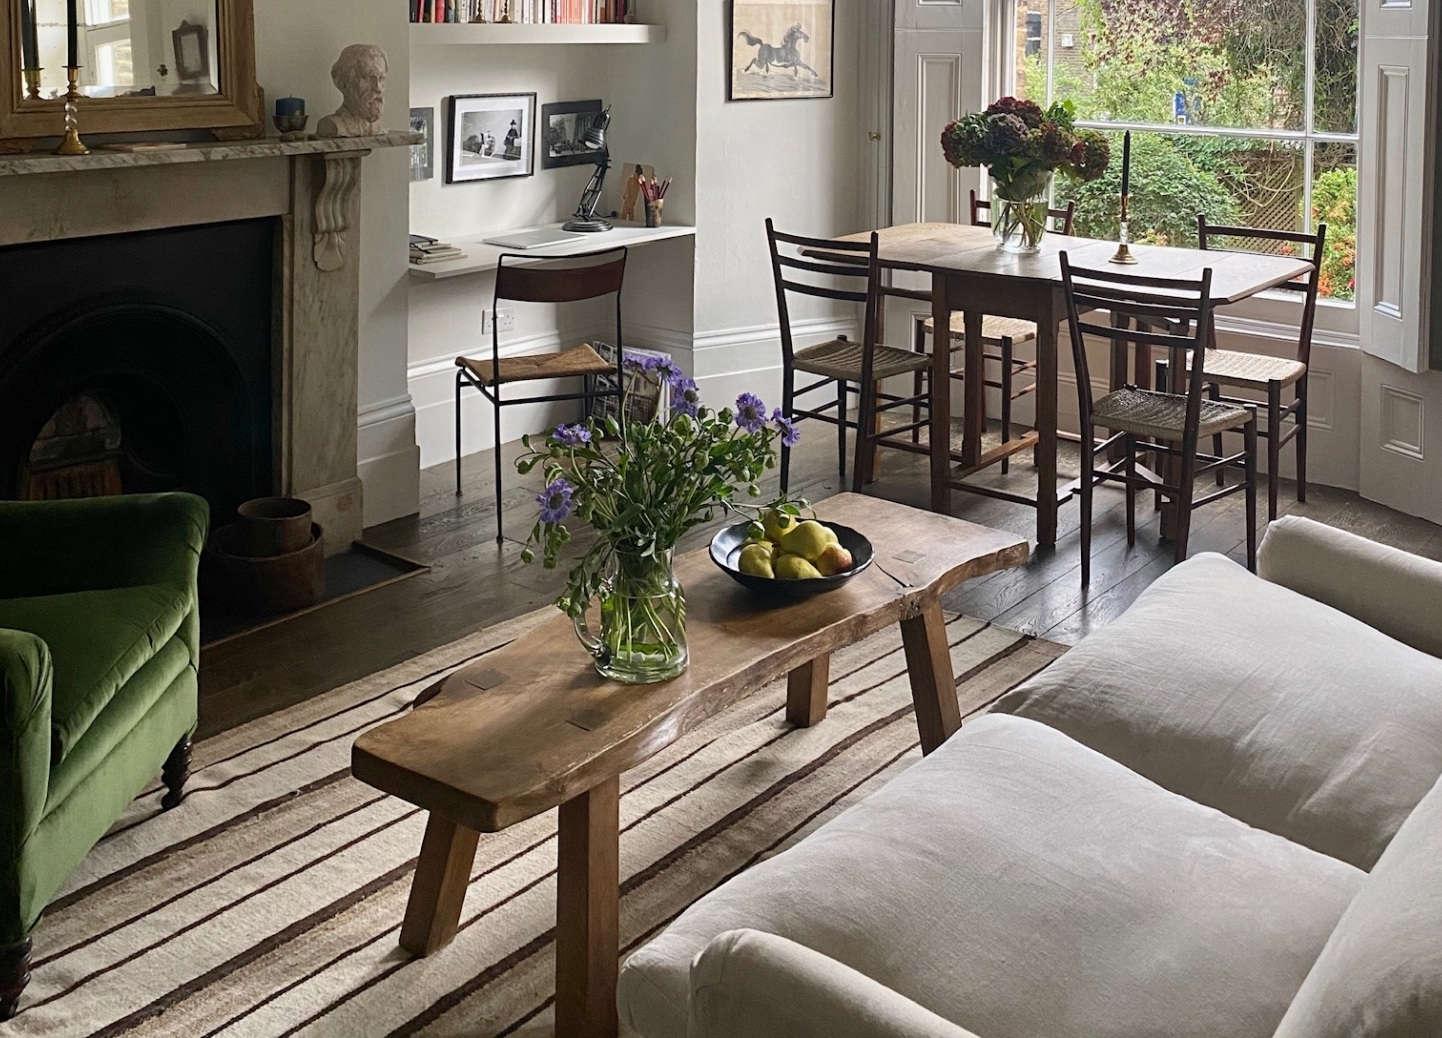 georgie stogdon curios shop london apartment living room3 crop